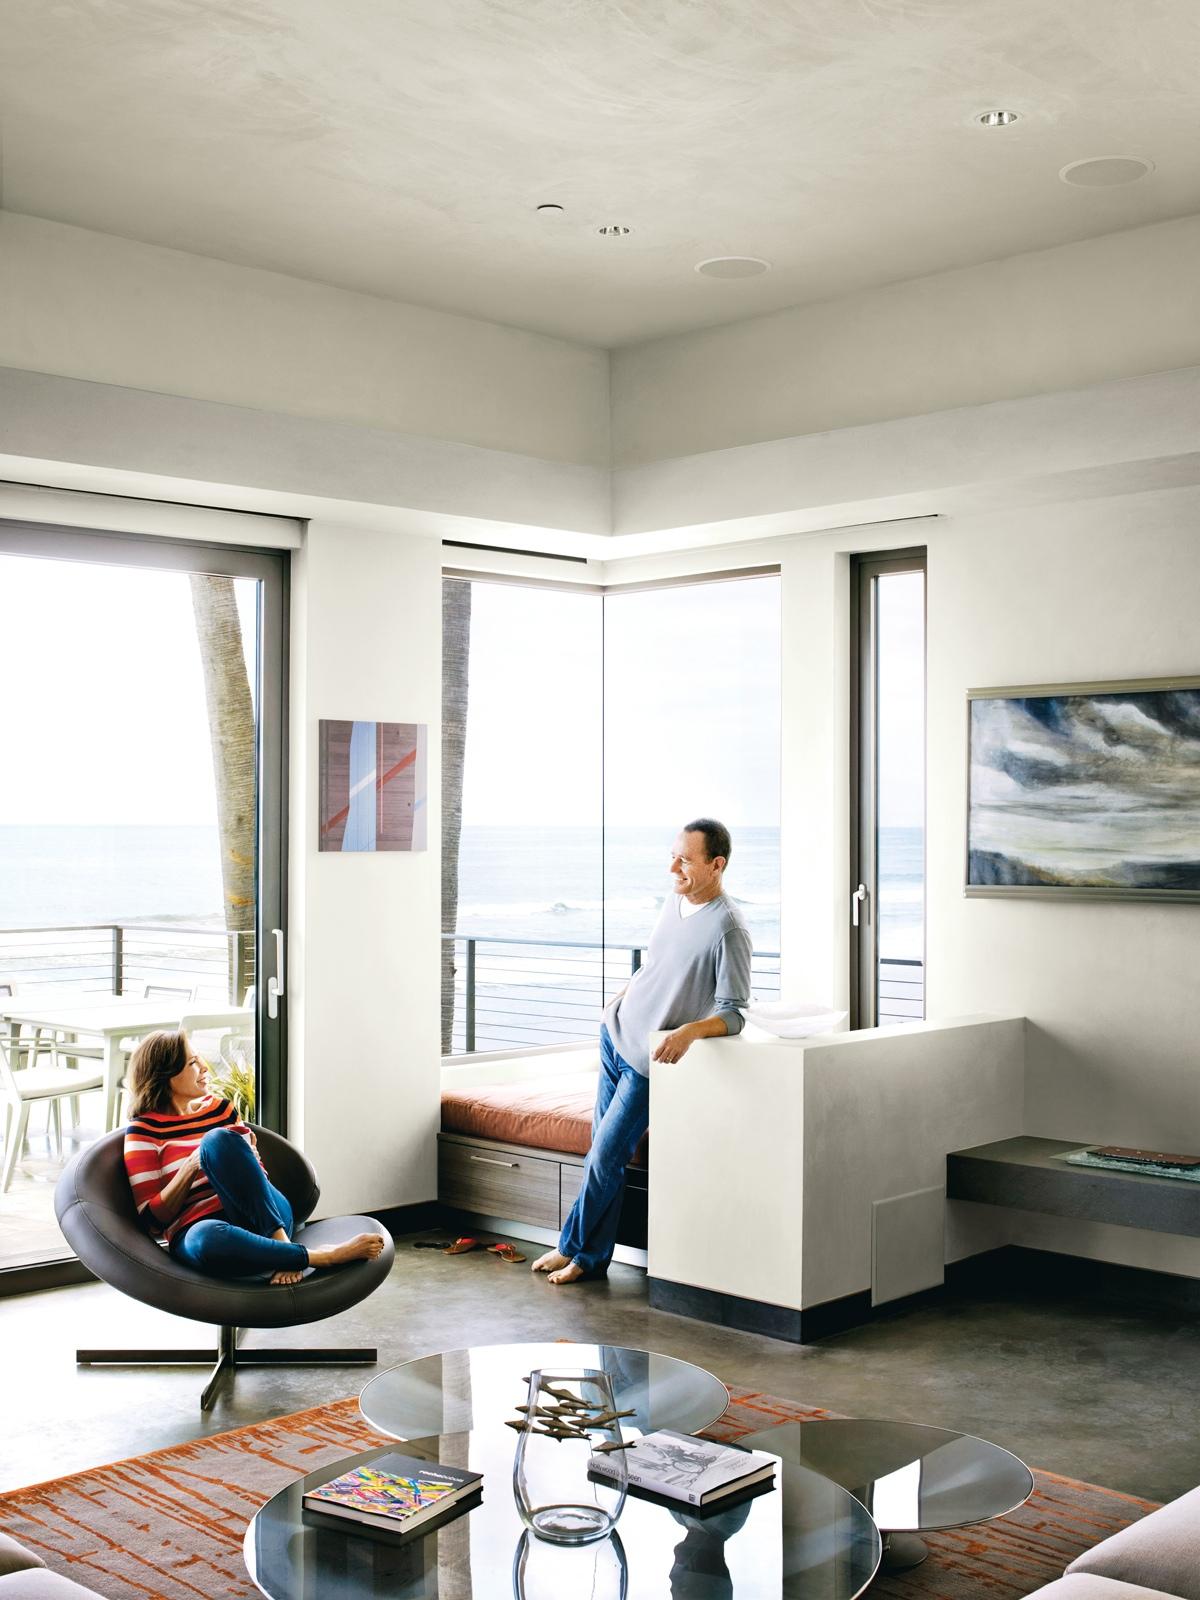 beach kitchen decor rental nyc bryan cranston's house